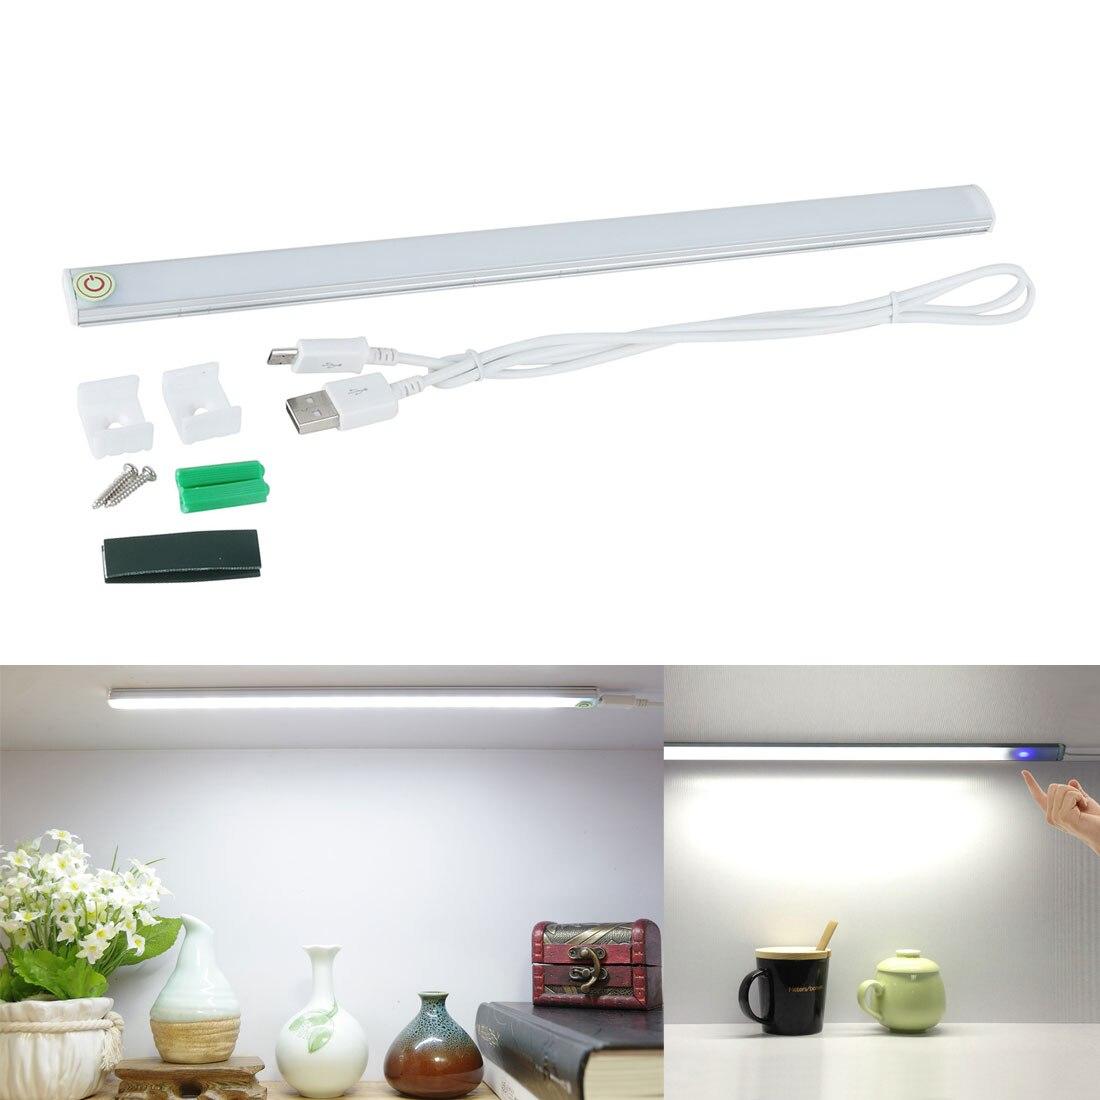 Us 654 26 Offled Touch Sensor Licht Buis Dimbare Usb 21 Leds Bar Lade Kast Garderobe Kast Keuken Slaapkamer Camping Night Lamp Buis In Led Bar